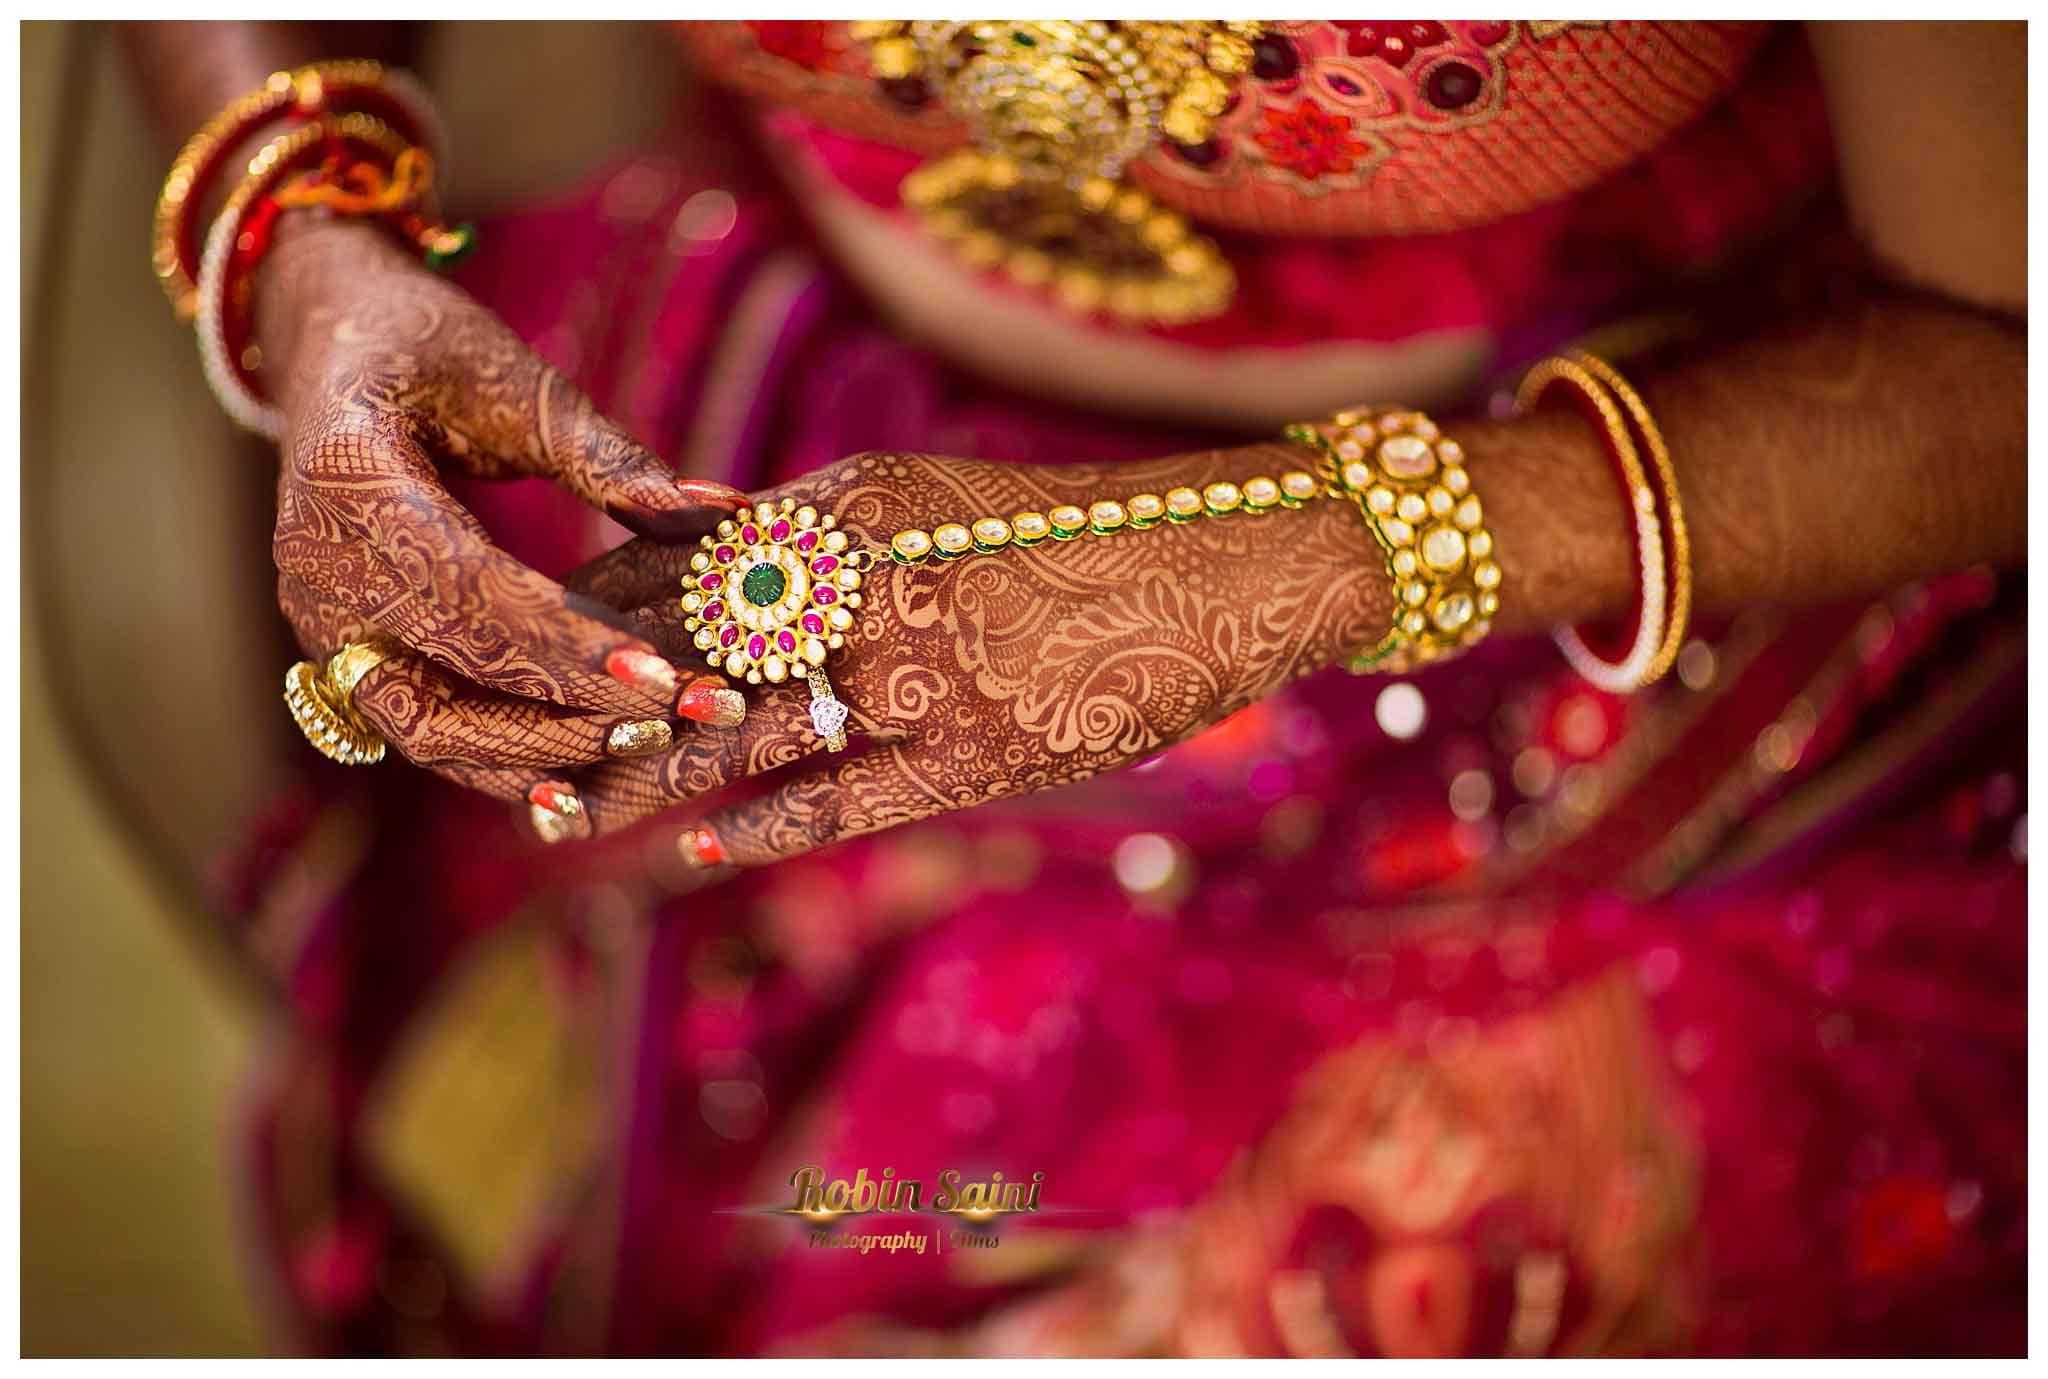 bridal mehndi:robin saini photography